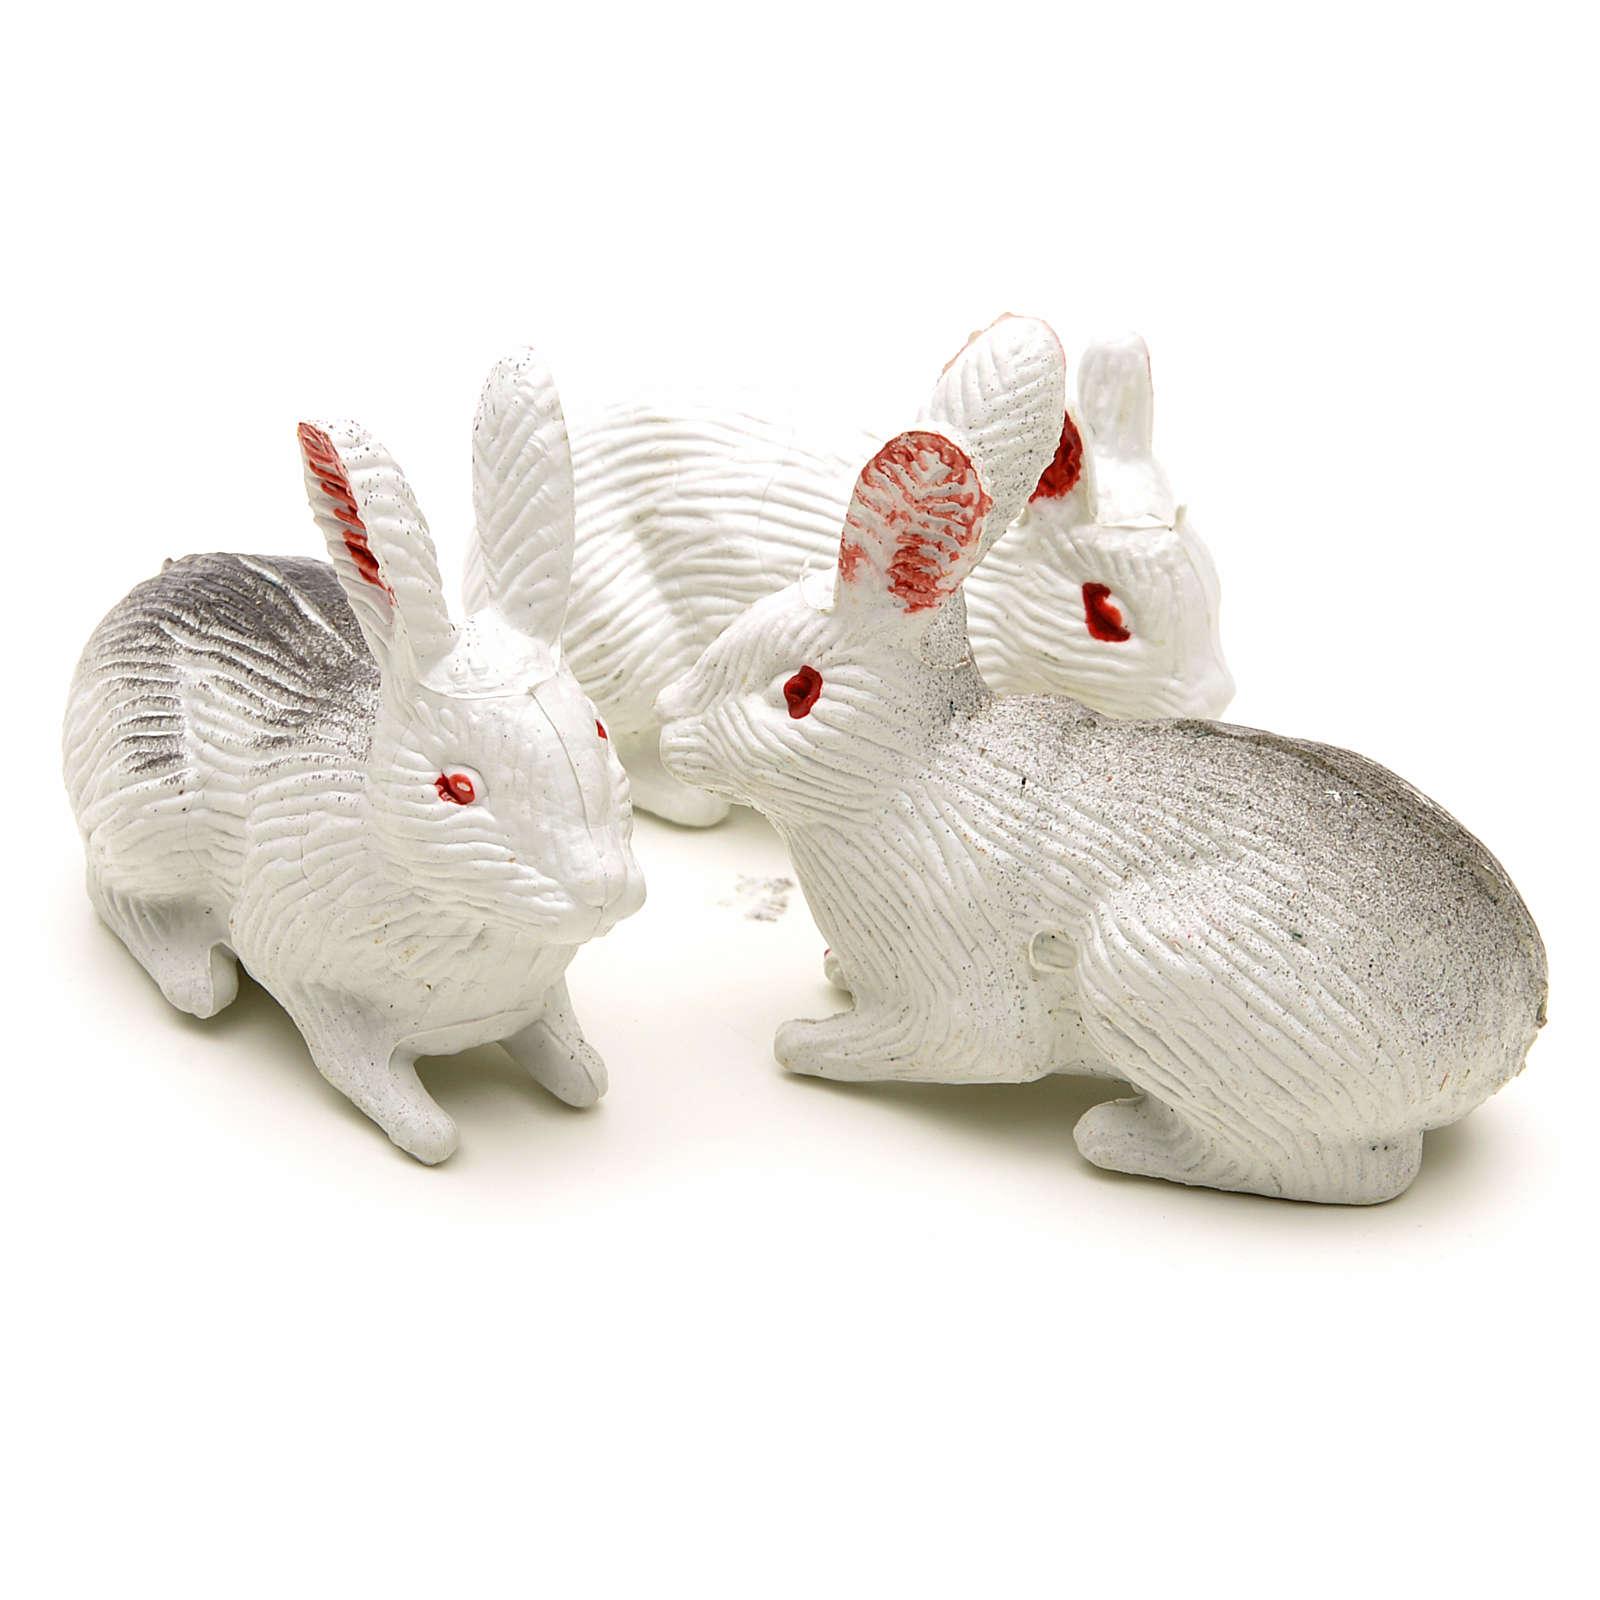 Famiglia di conigli 12 cm 3 pz 3